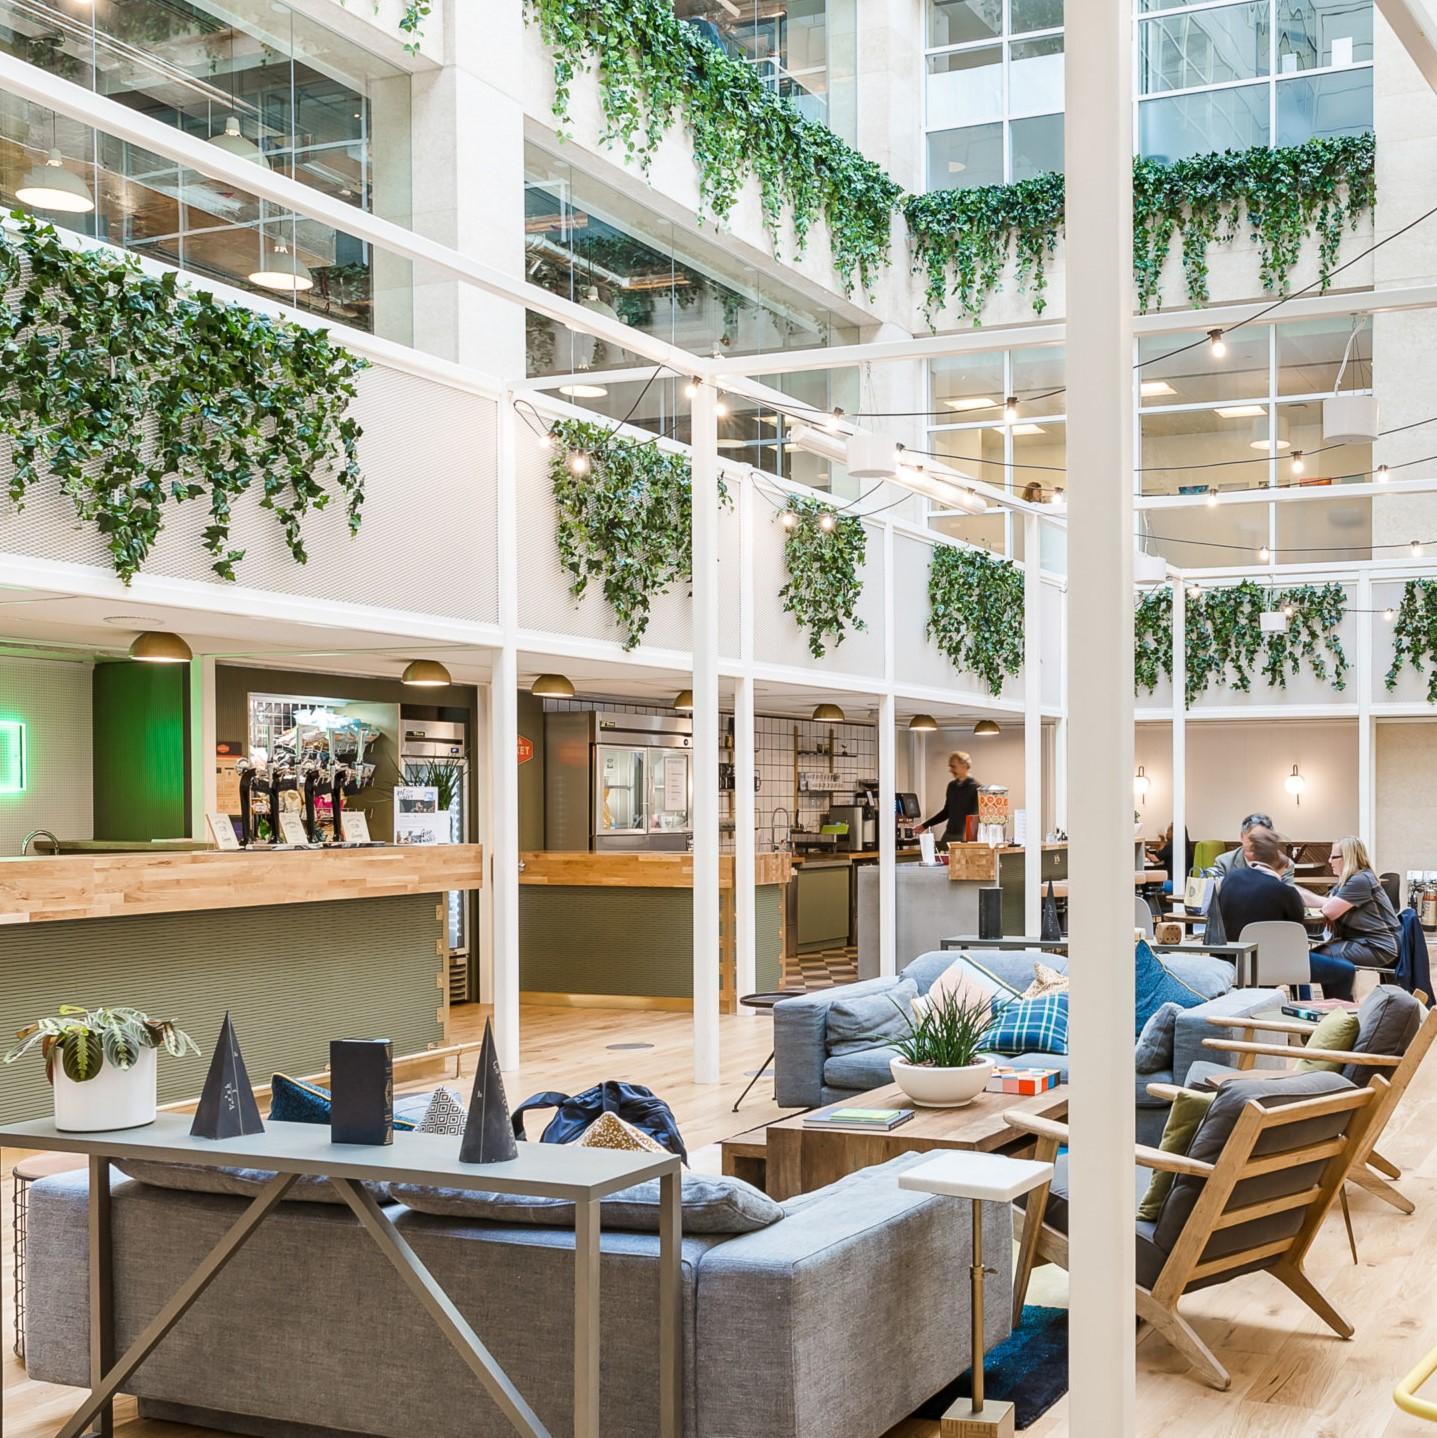 Office design stifling creativity, claims study